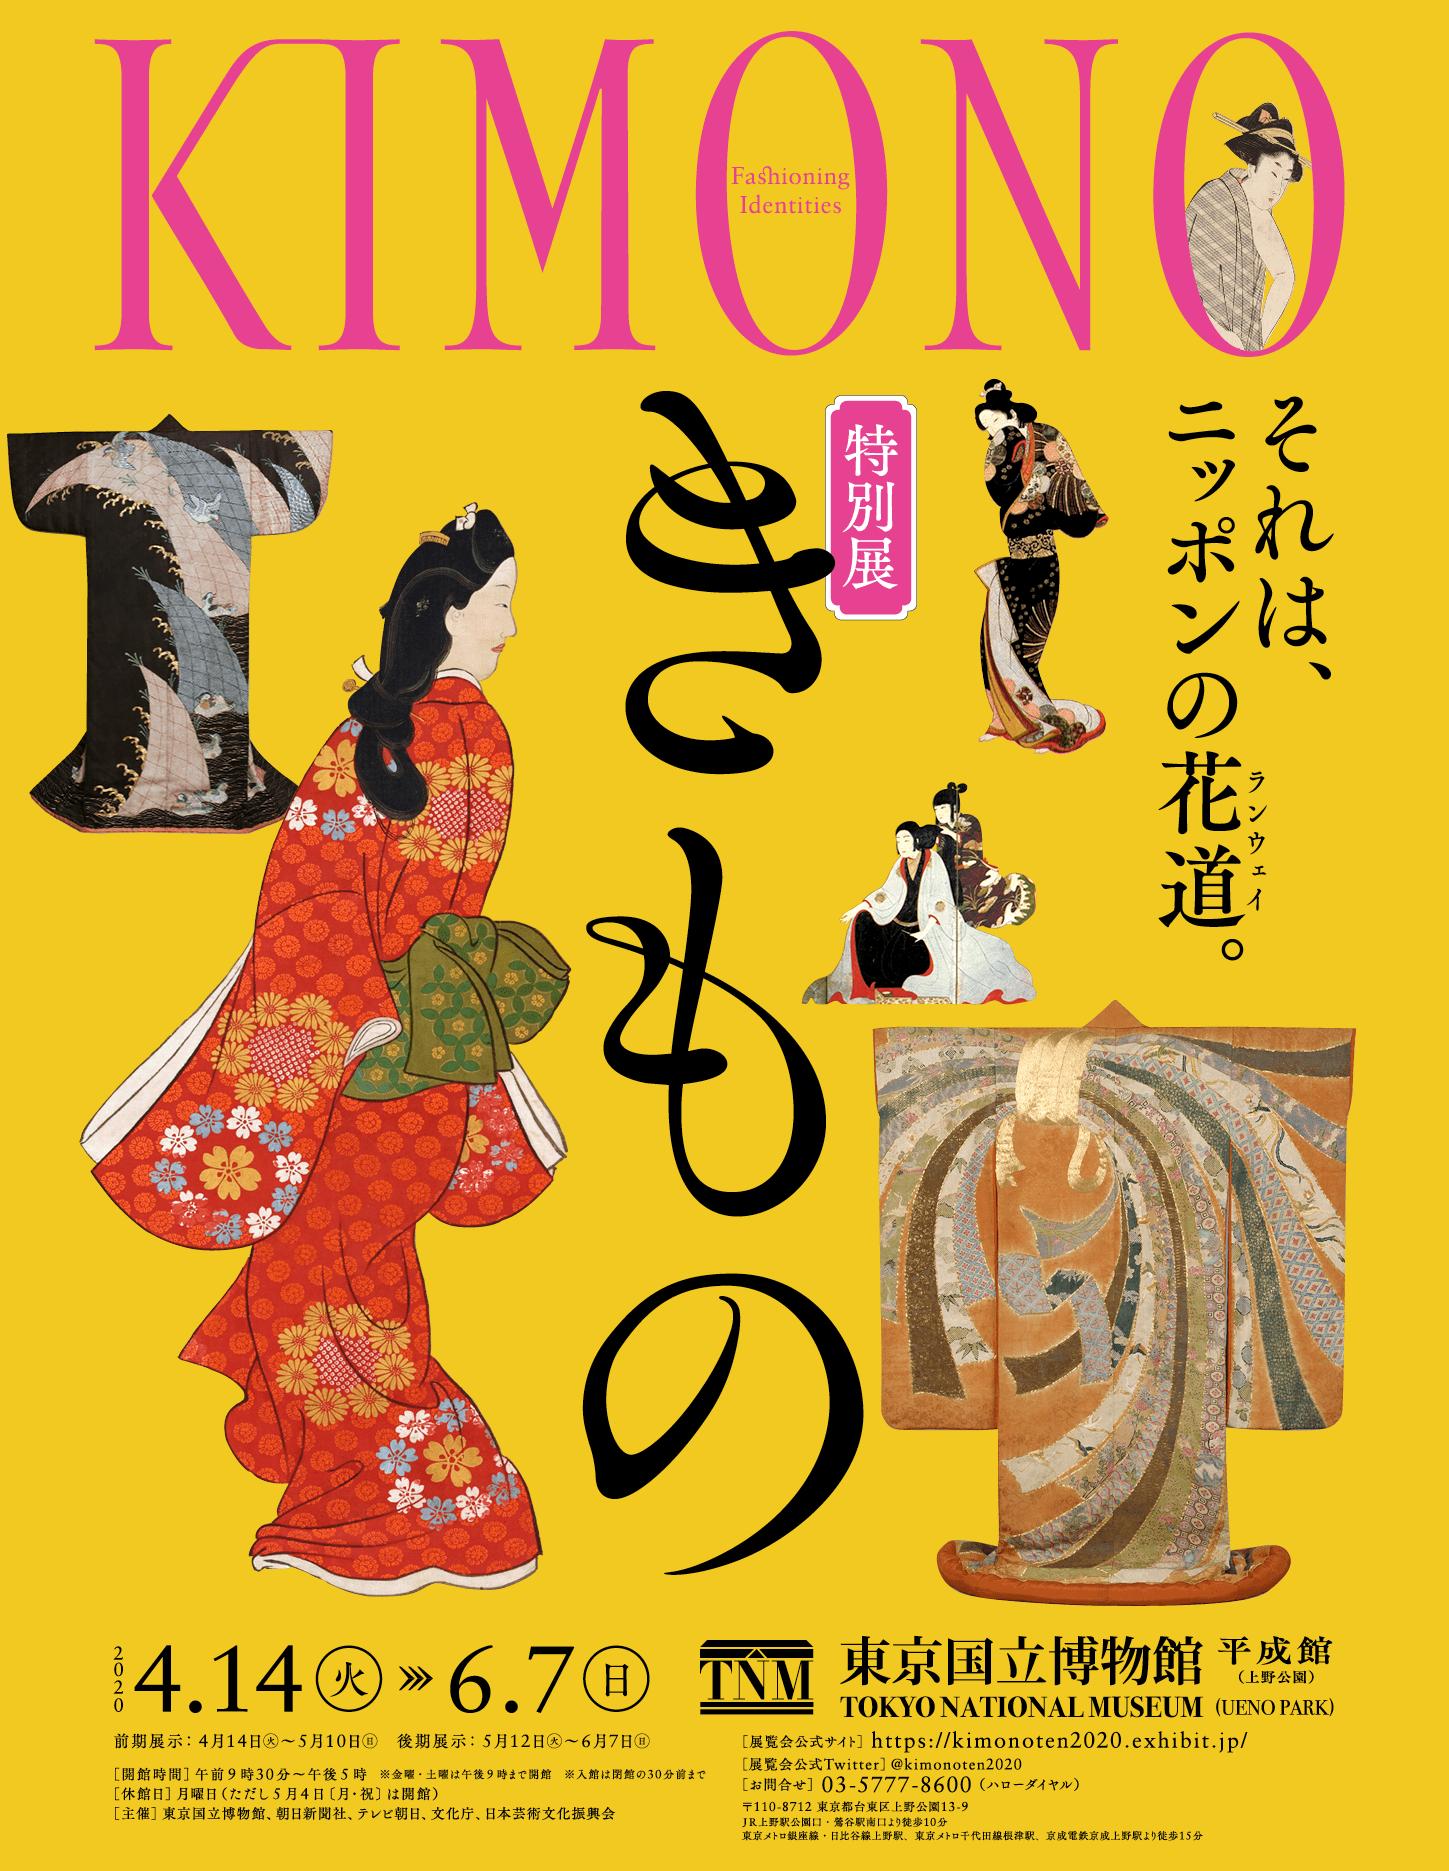 Sixteen kimono created by Itchiku Kubota to be exhibited at Tokyo National Museum